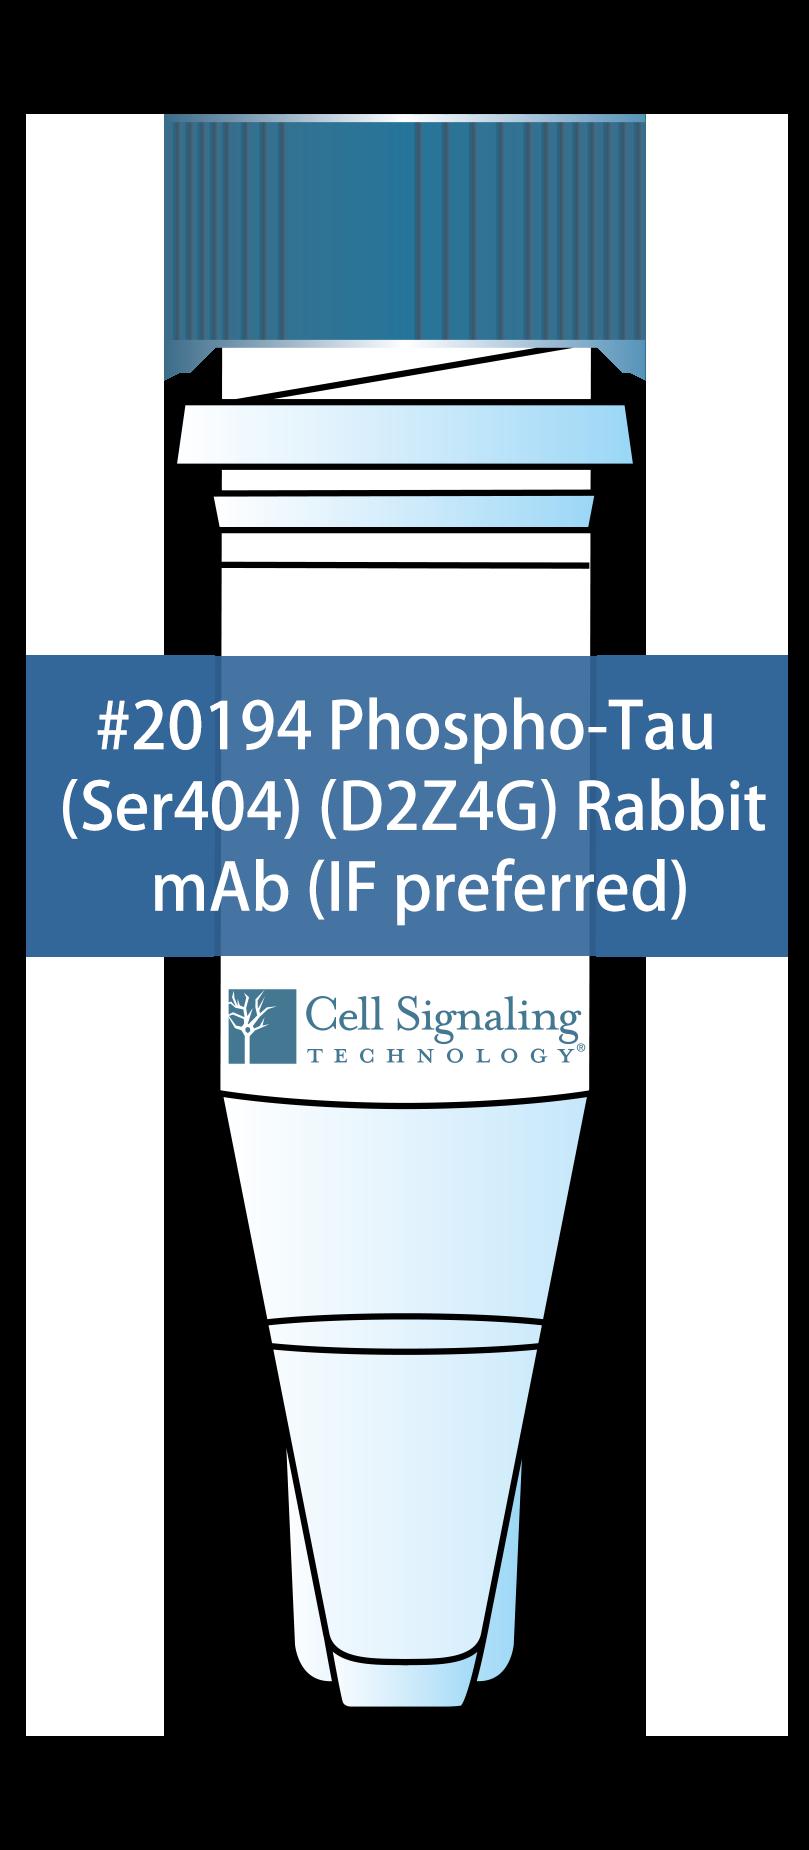 Phospho-Tau (Ser404) (D2Z4G) Rabbit mAb (IF preferred)